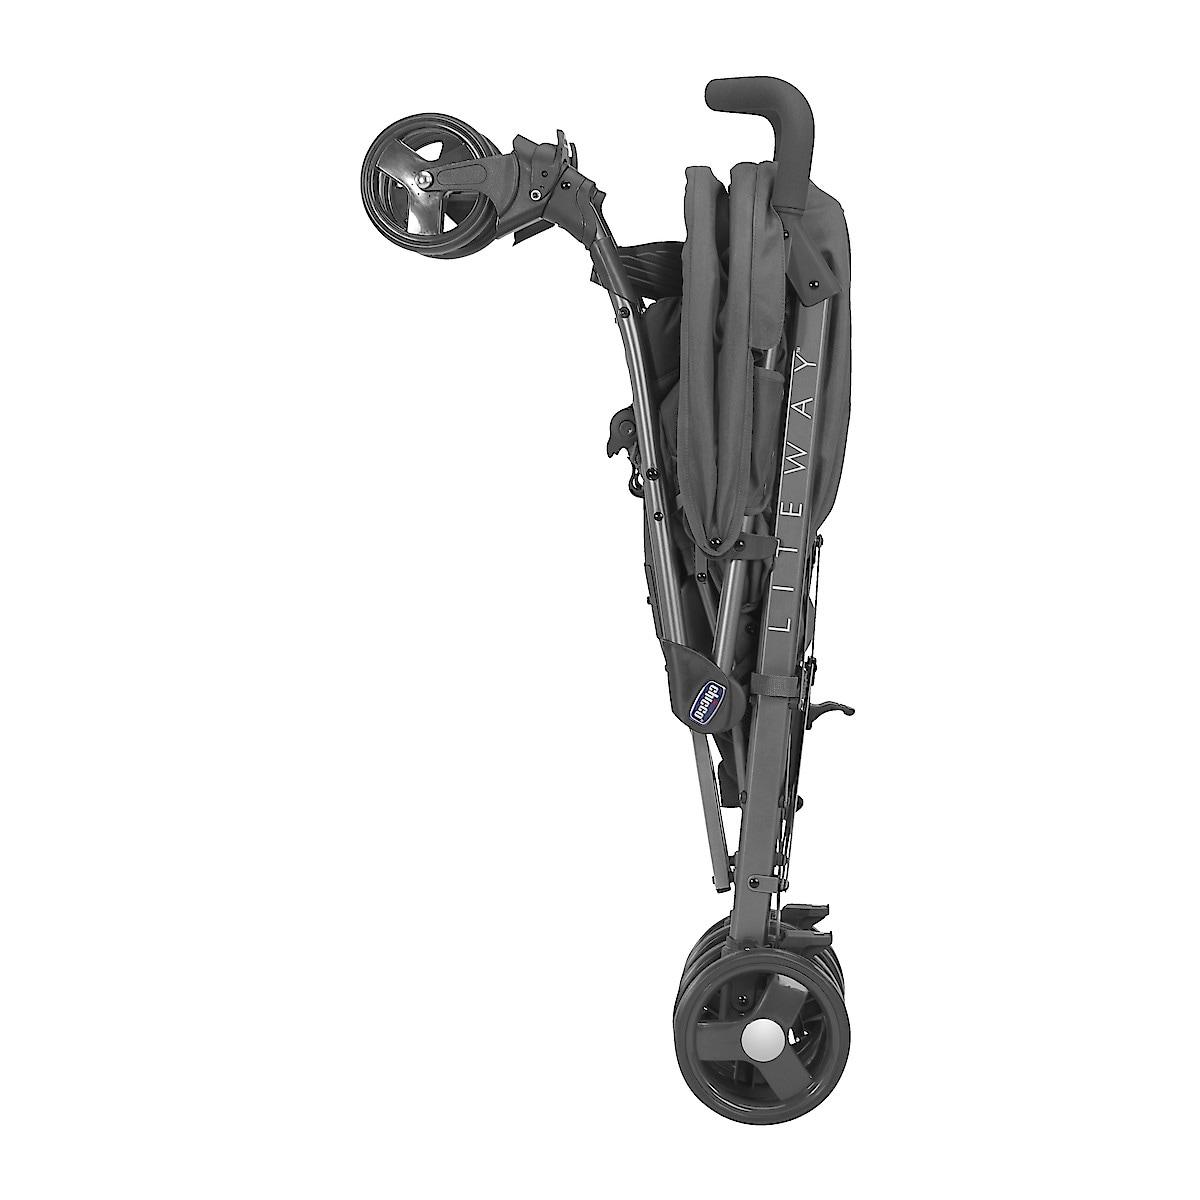 Chicco Liteway 2 Coal Stroller